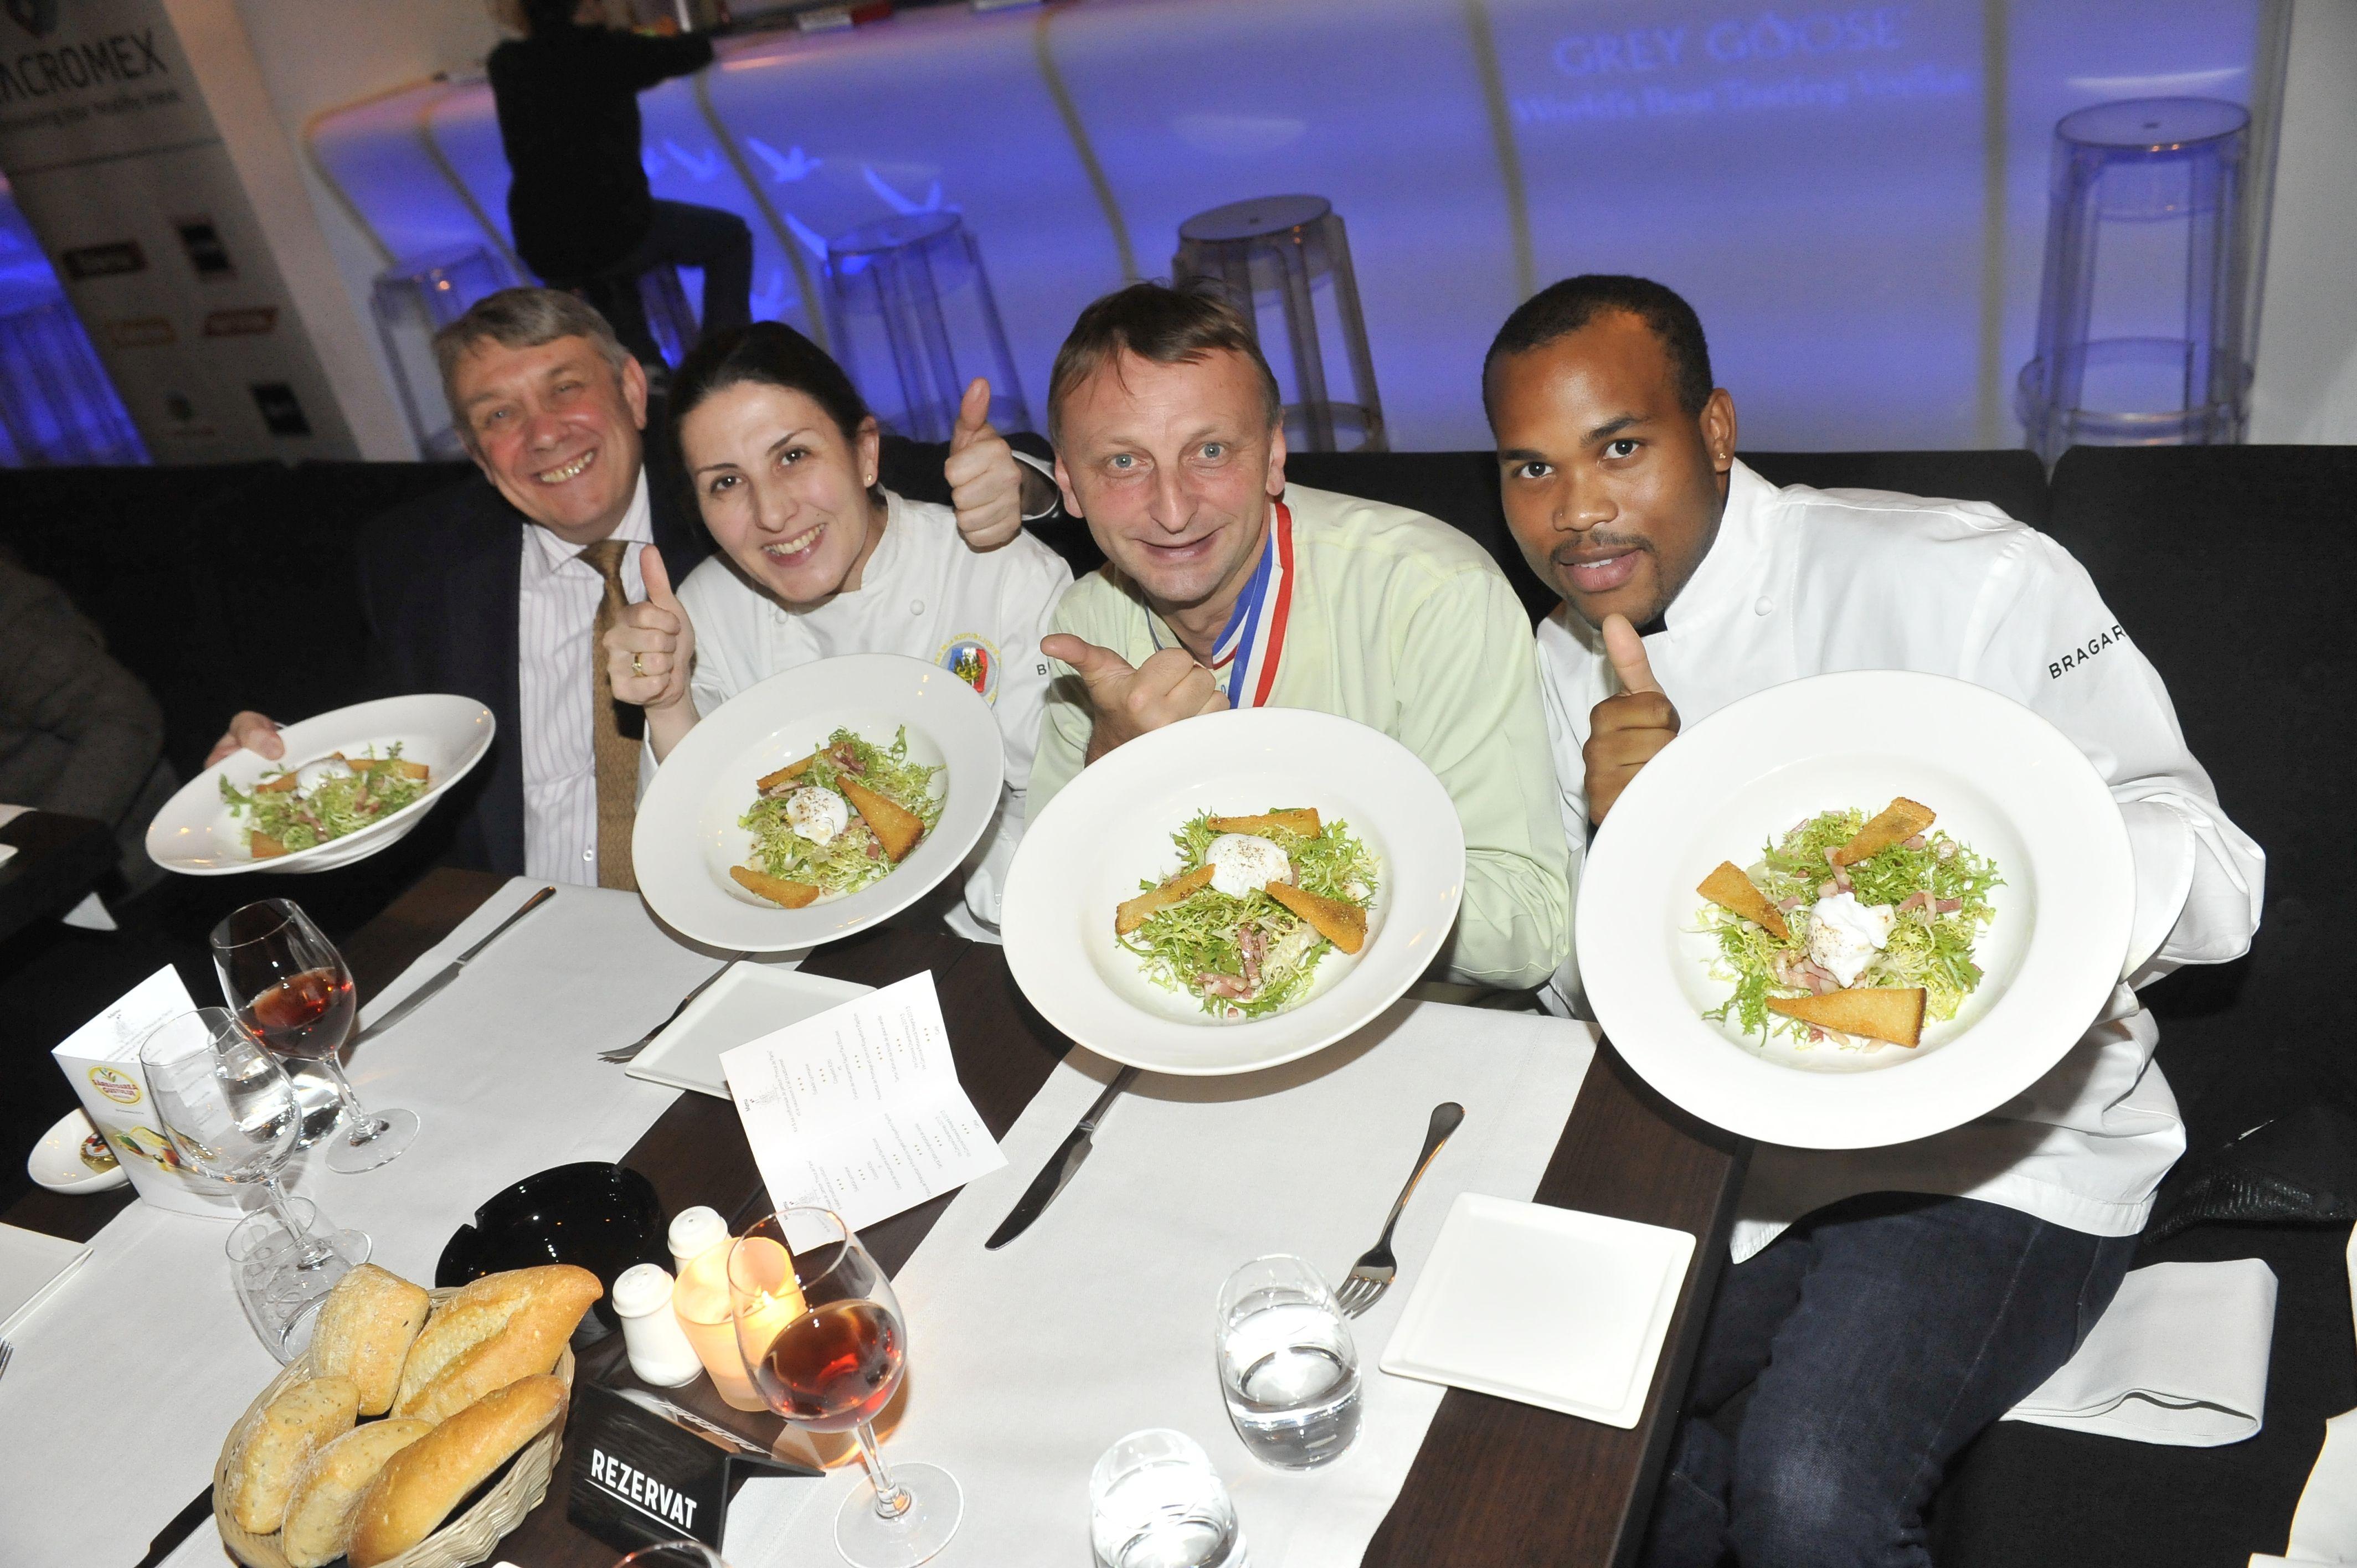 Sarbatoarea-Gustului-La-Grade-Tablee-47-Chef-VIP01